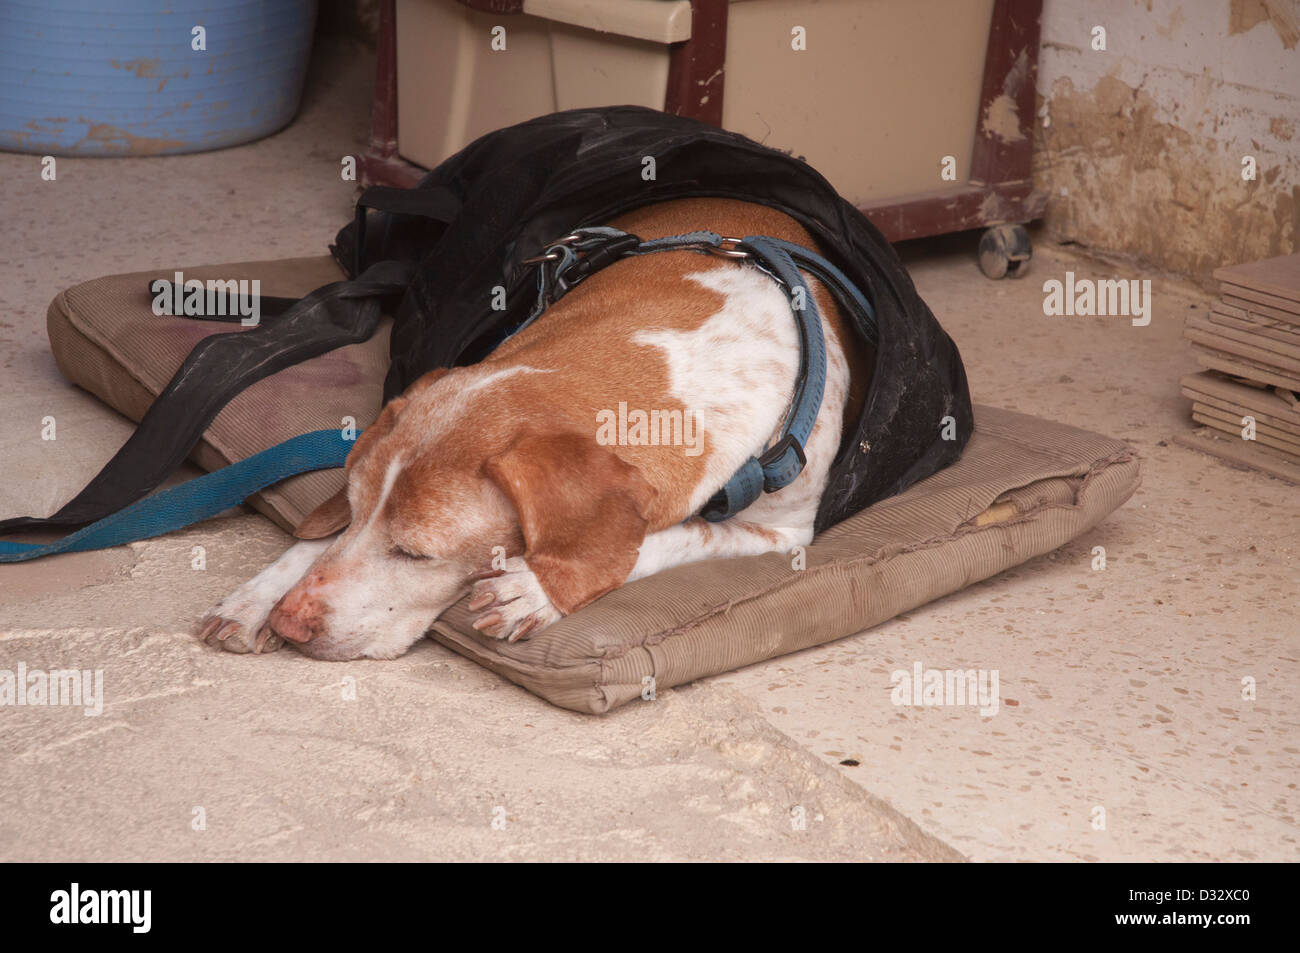 dog sleeping on old cushion, dog lead , dog collar, hard floor, inside shop, relaxing, snoozing resting - Stock Image